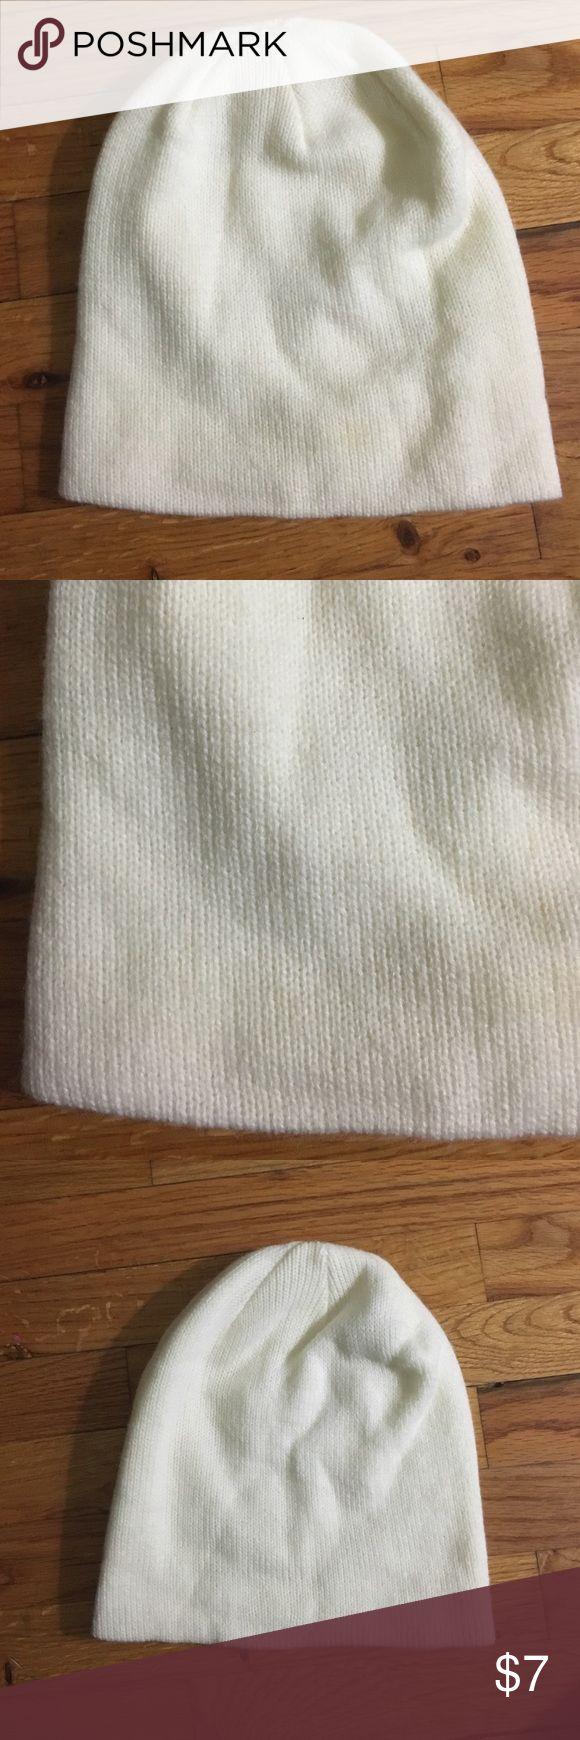 White beanie So soft!! Never worn!! Forever 21 Other